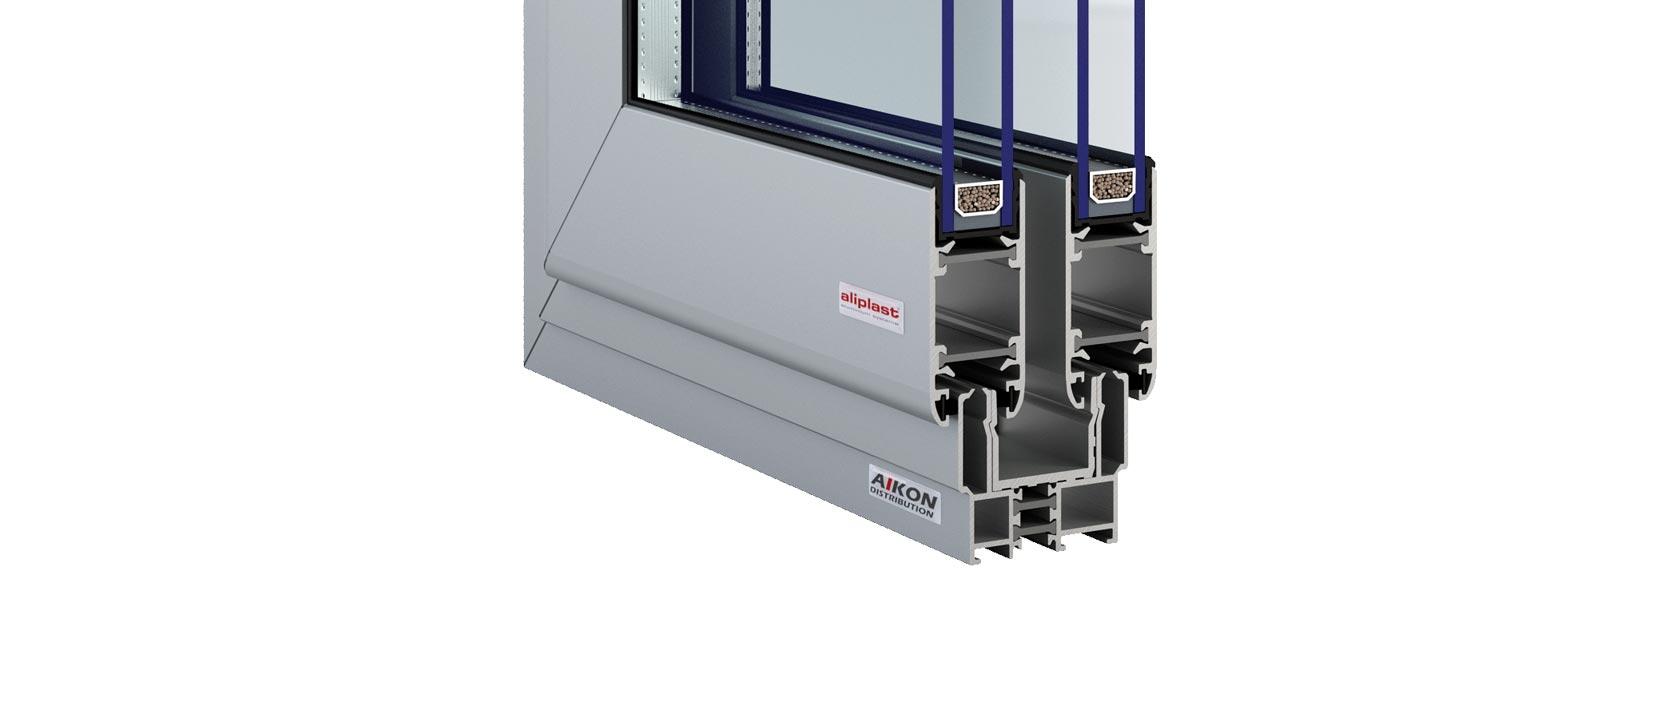 Porte coulissante aluminium for Porte fenetre alu coulissante